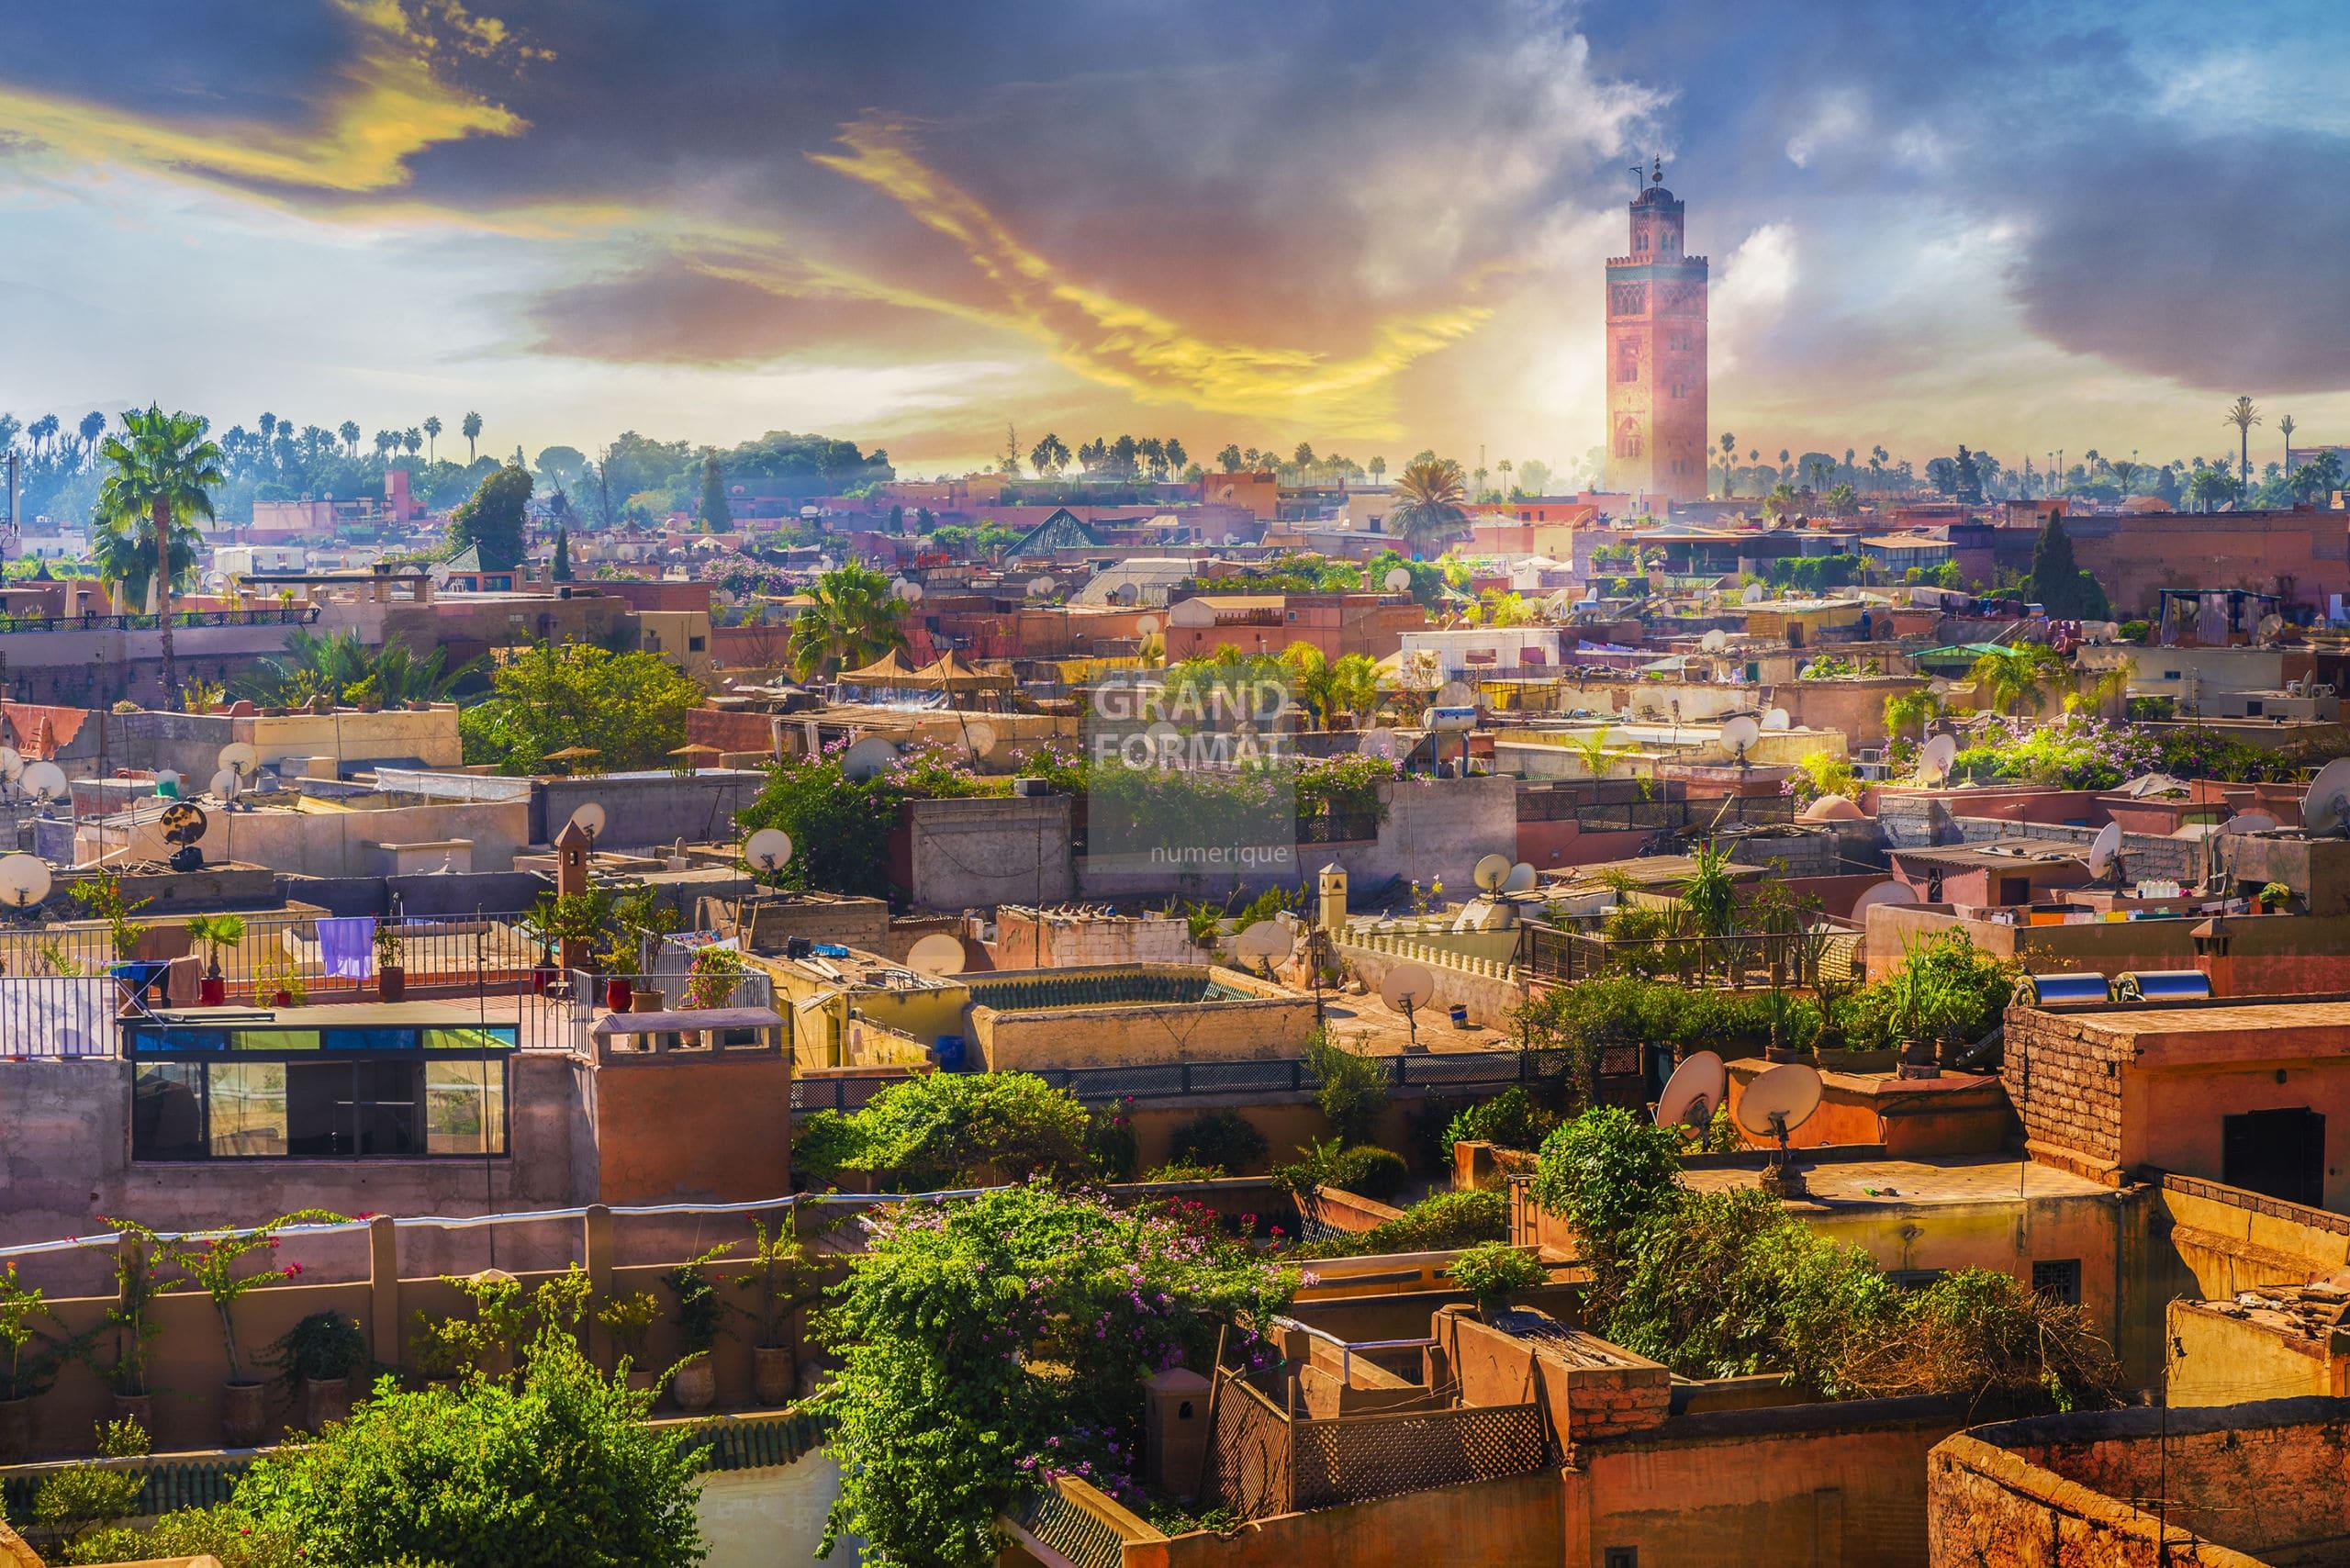 Medina Maroc photo impression et toile